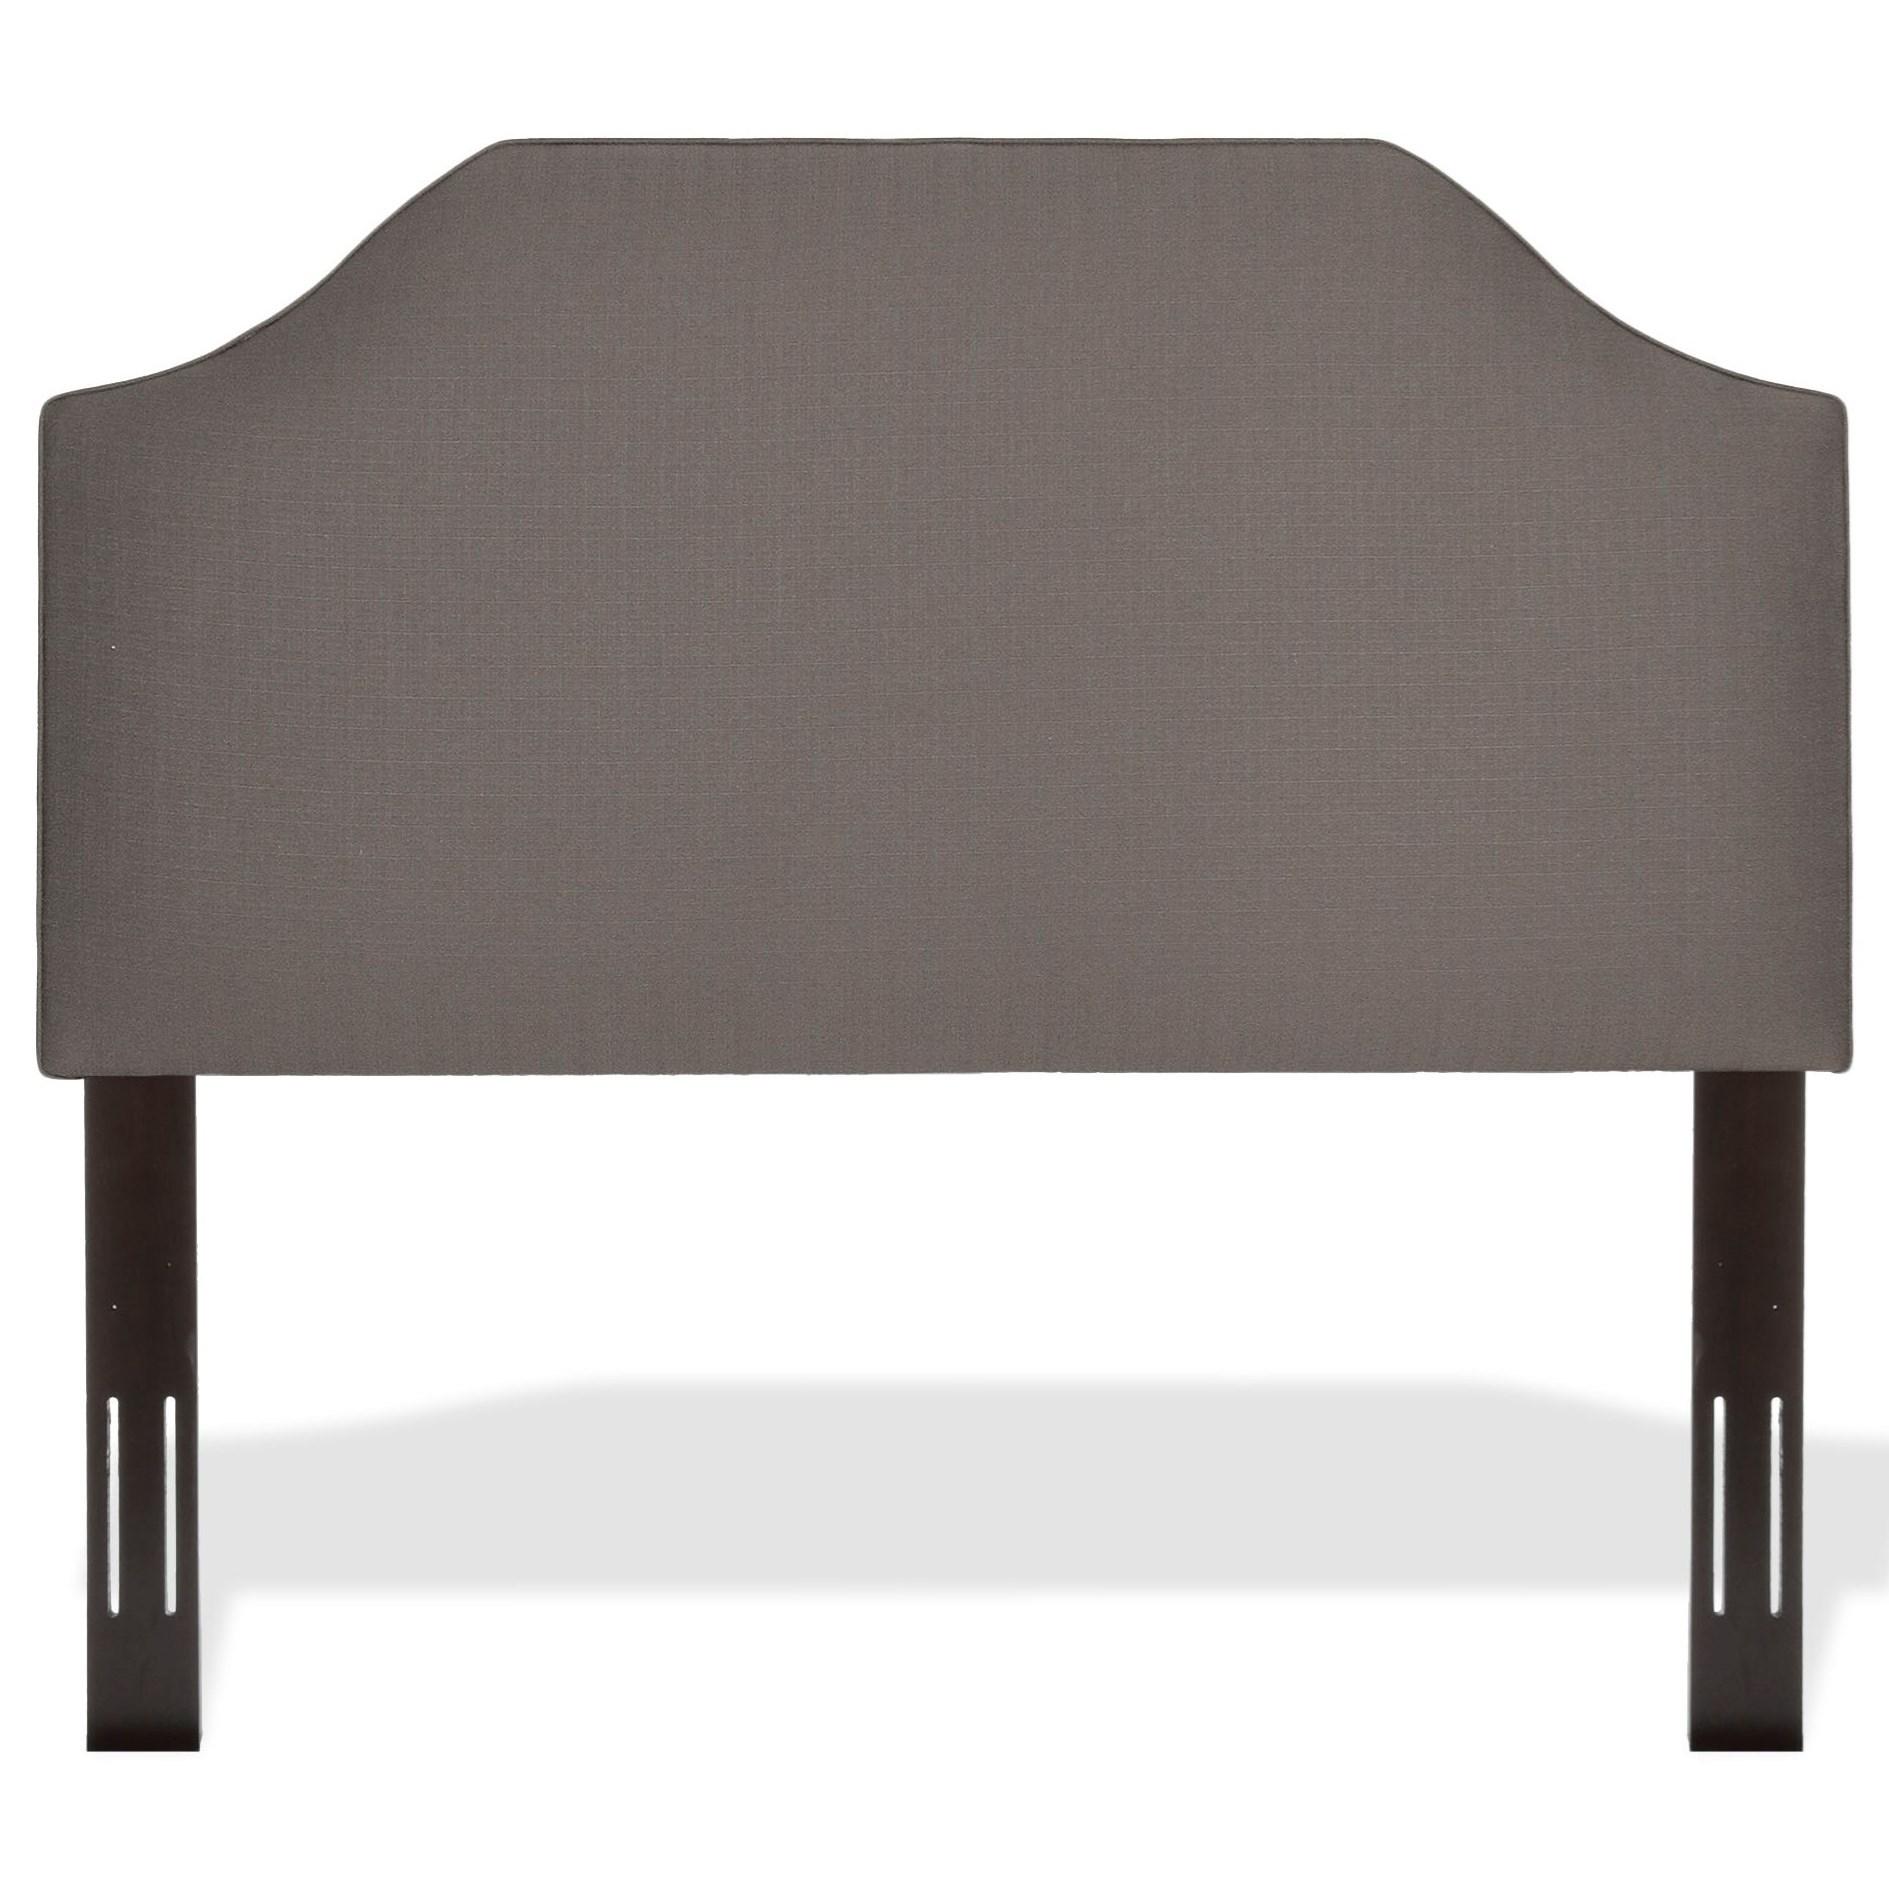 twin bordeaux upholstered headboard by fashion bed group  wolf  - twin bordeaux upholstered headboard